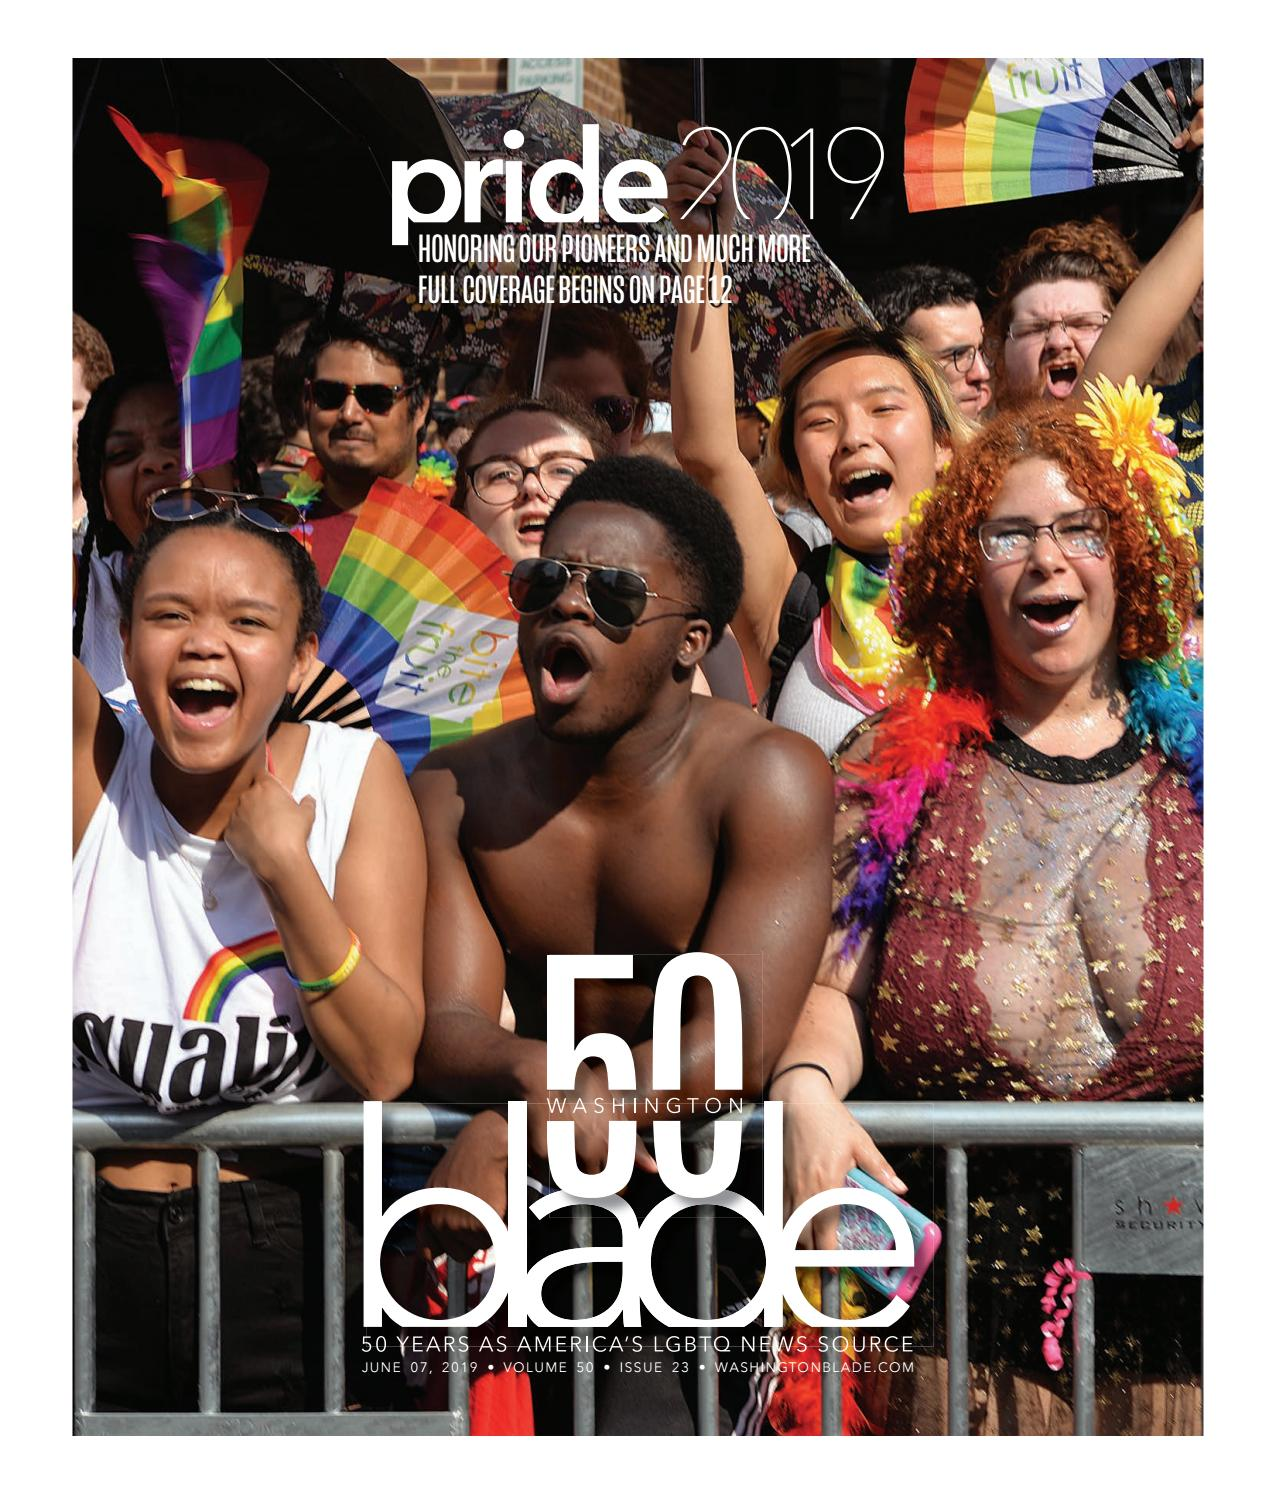 Washingtonblade.com, Volume 50, Issue 23, June 7, 2019 by Washington Blade  - issuu